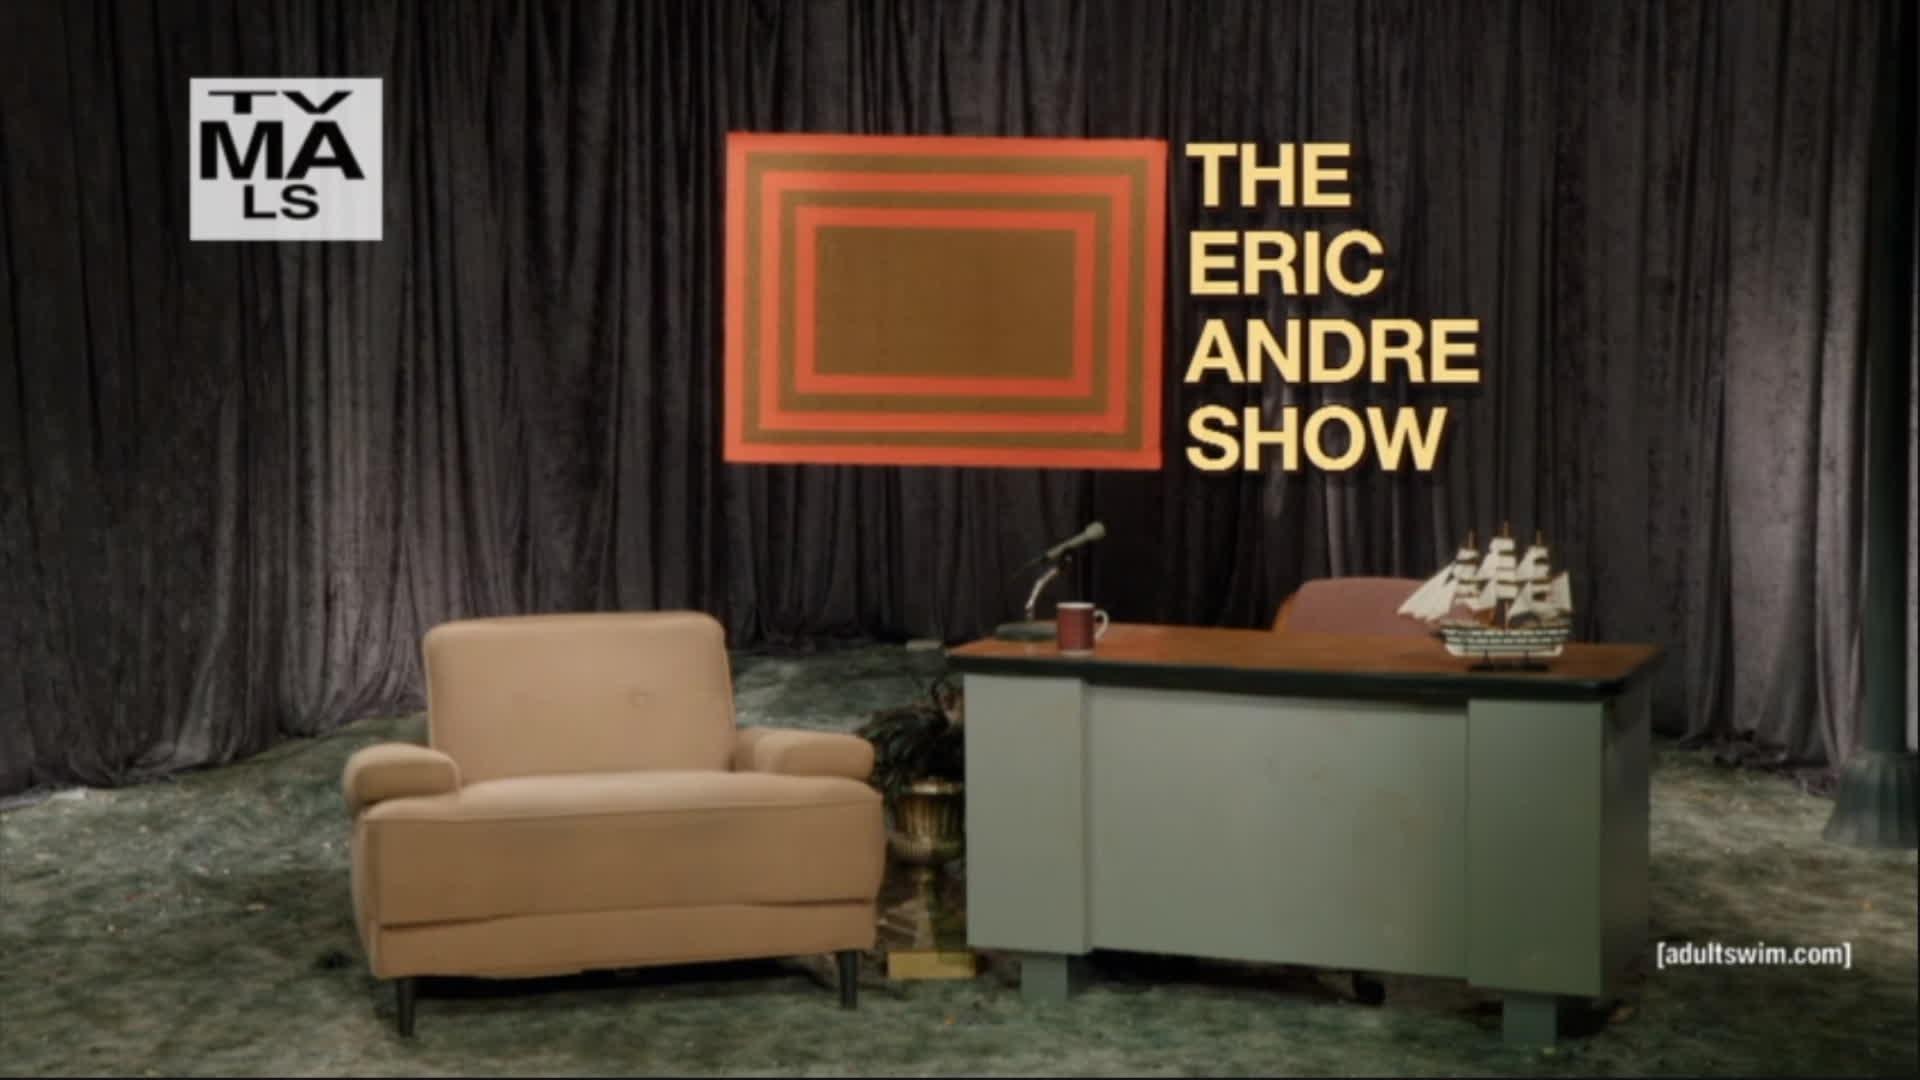 TheEricAndreShow, Warp, Eric Andre can warp GIFs